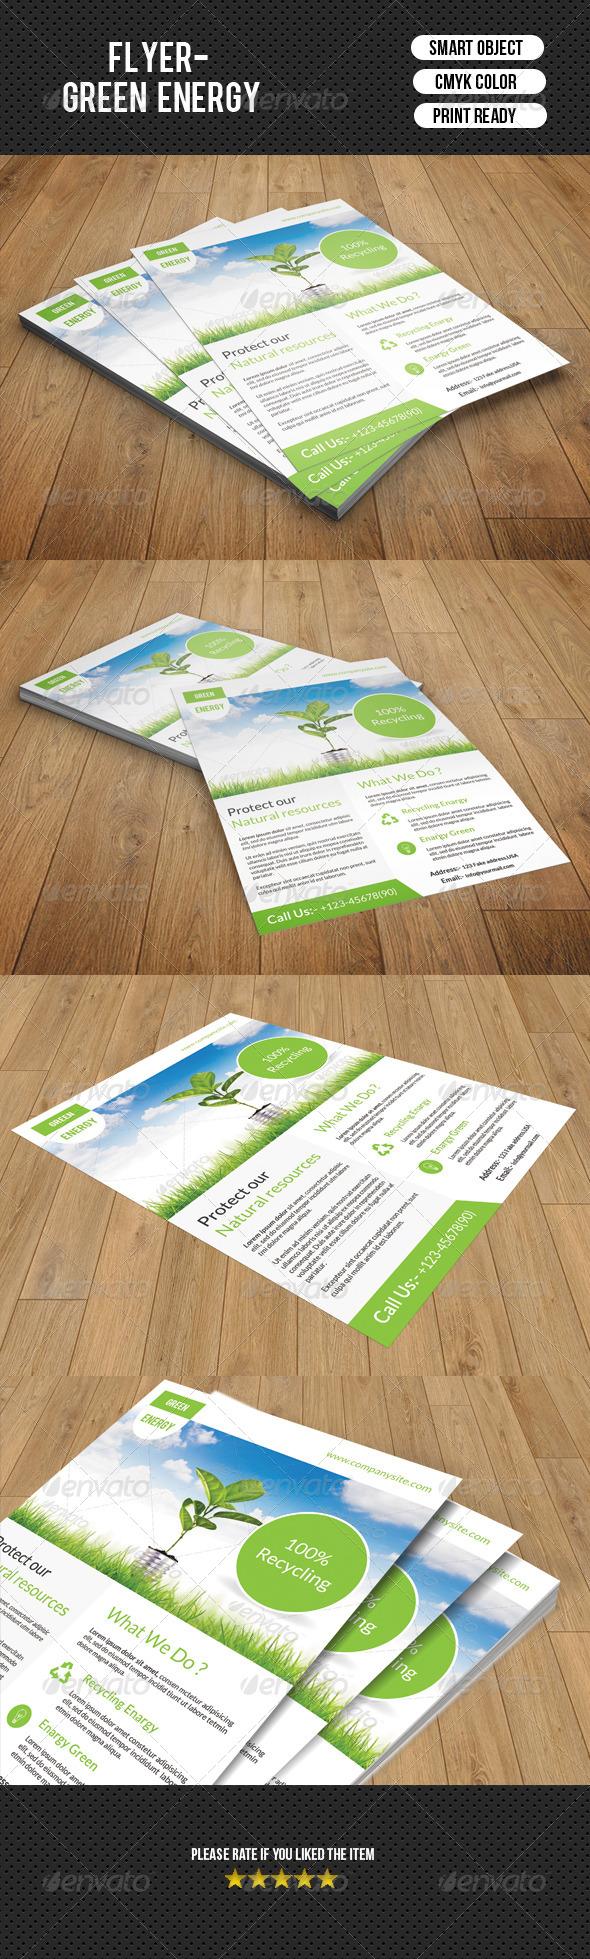 GraphicRiver Green Energy Flyer-V94 8435422